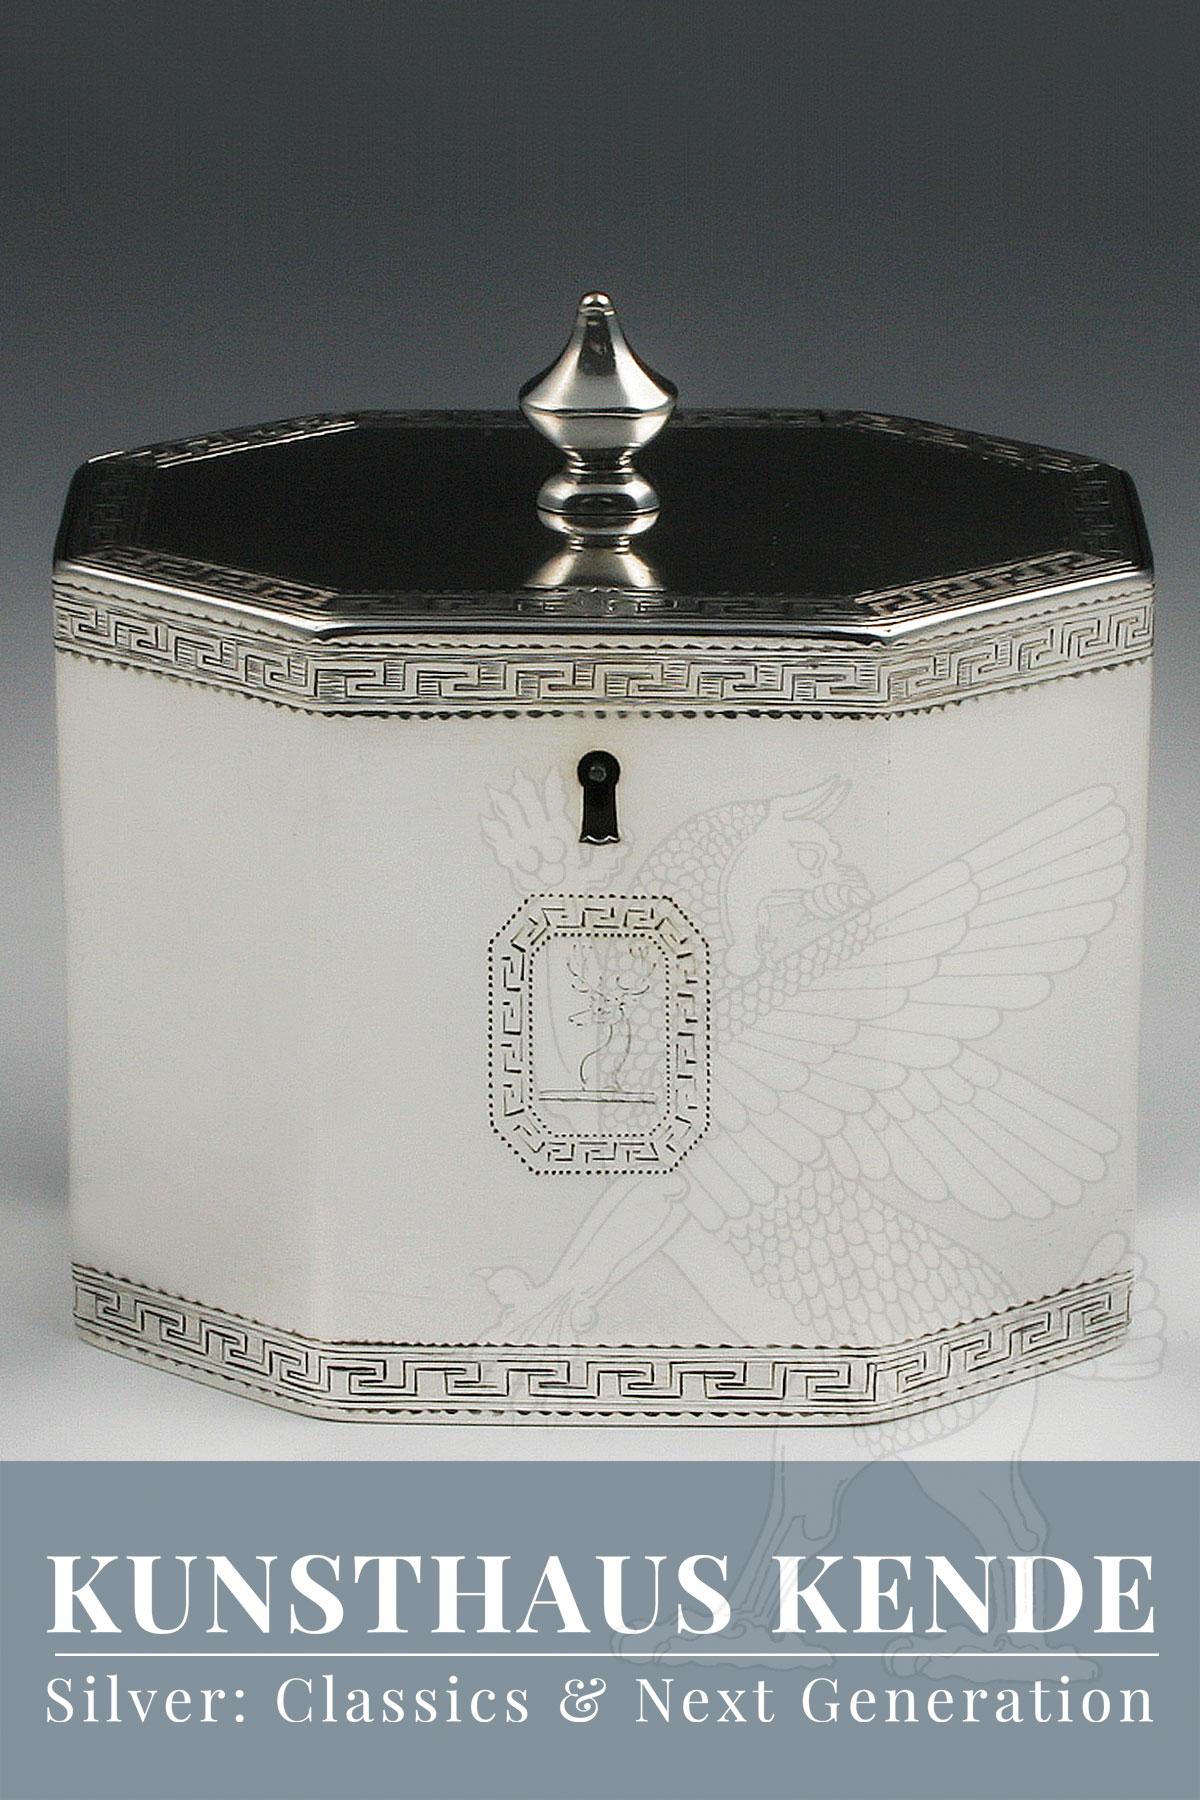 teedose sterling silber London 1787 antik alte englische george iii englische